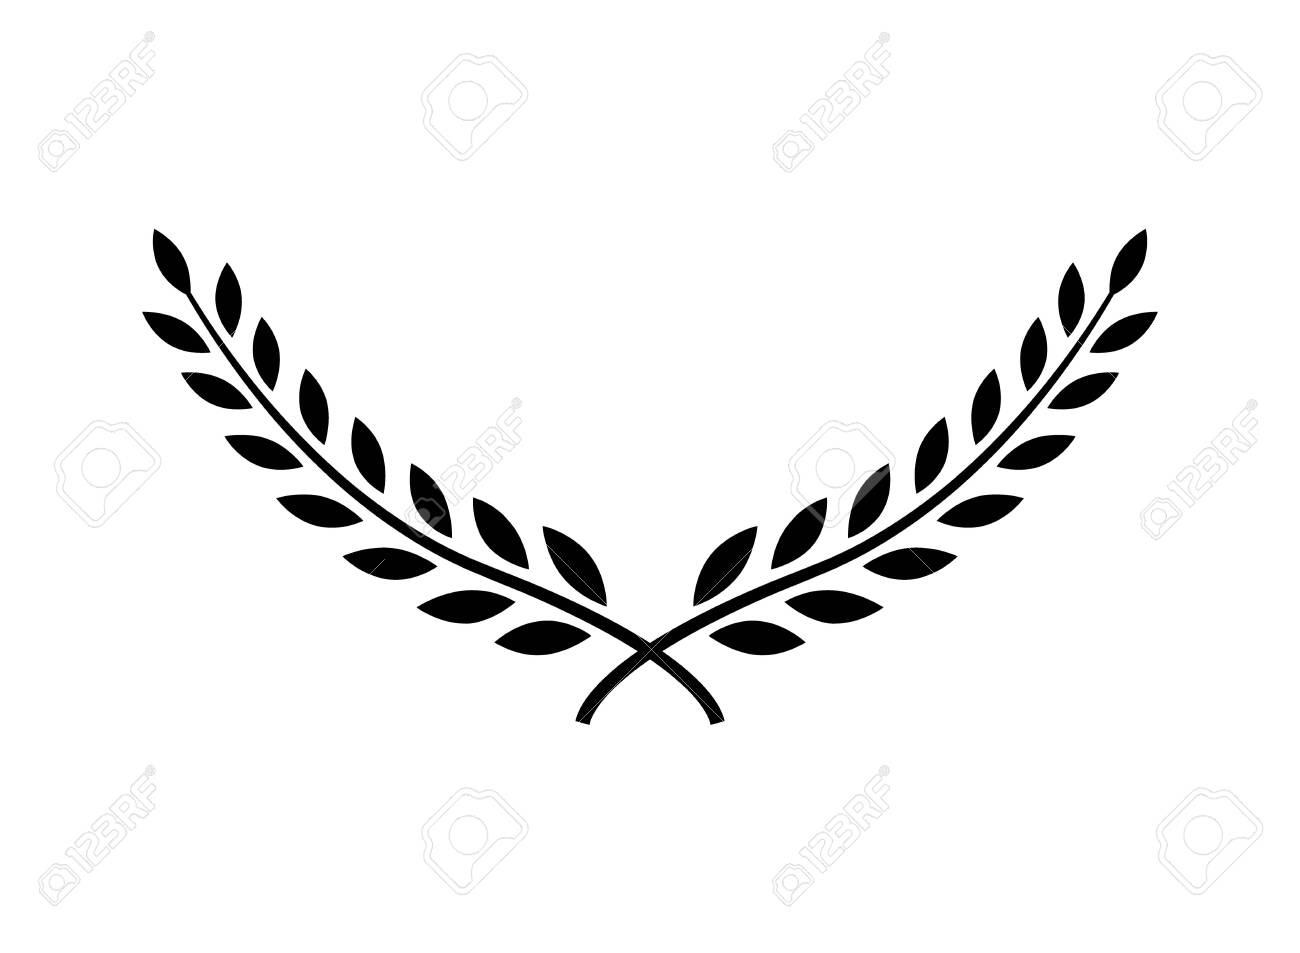 Laurel wreath vector award branch victory icon. Winner laurel wreath vintage leaf emblem - 136943466